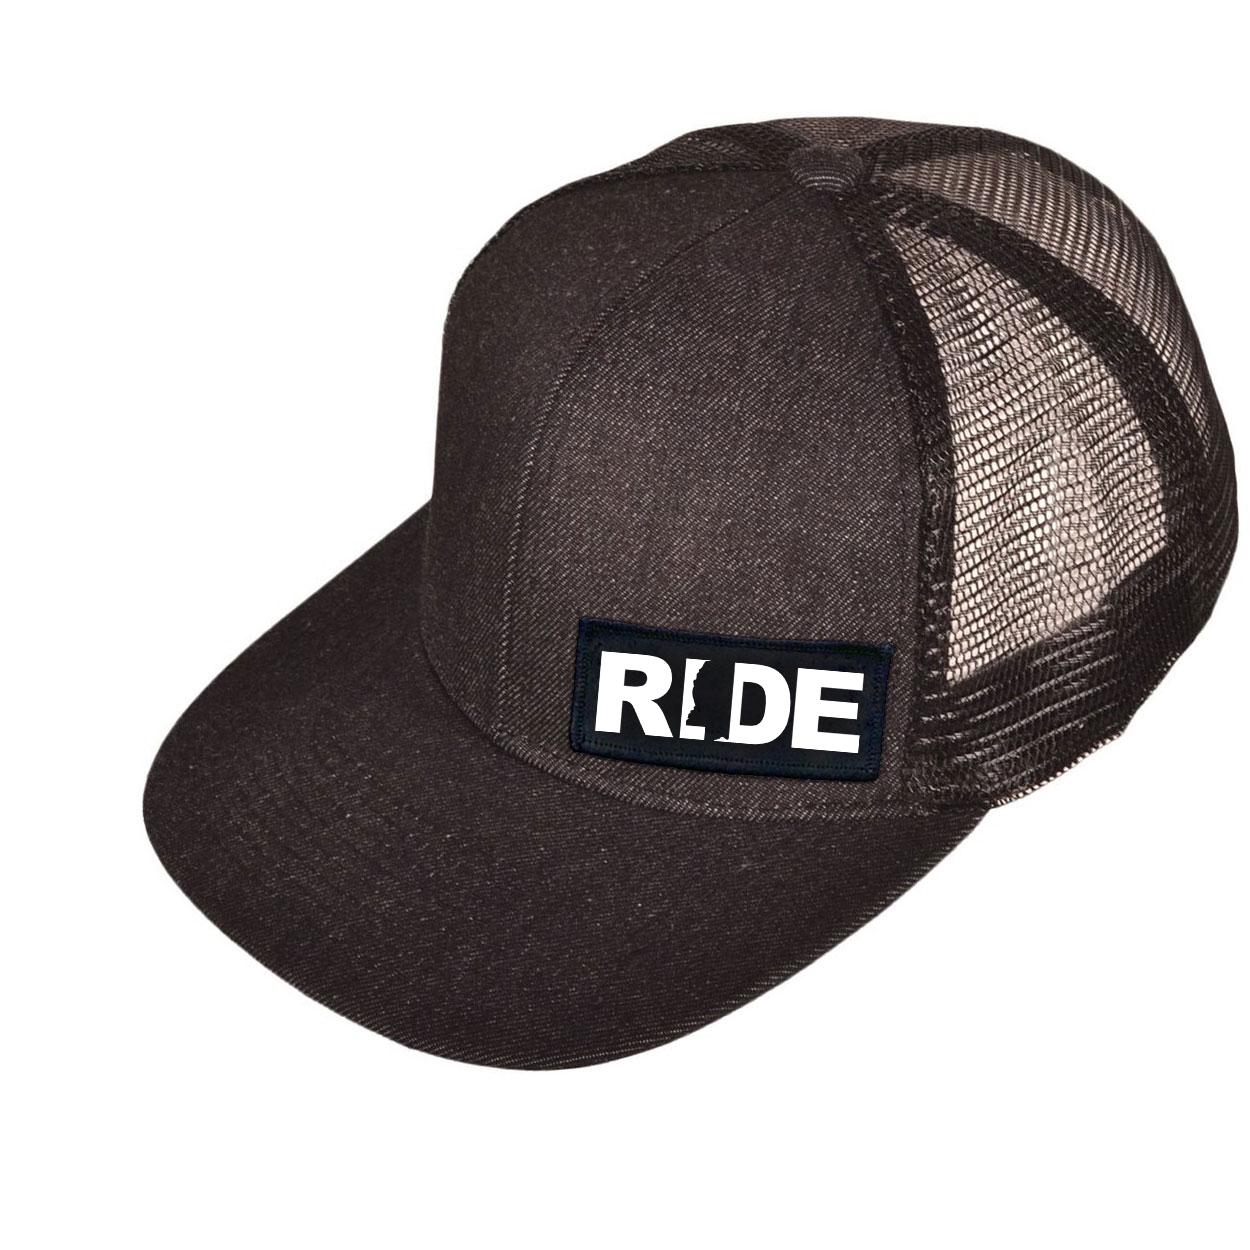 Ride Mississippi Night Out Woven Patch Snapback Flat Brim Hat Black Denim (White Logo)